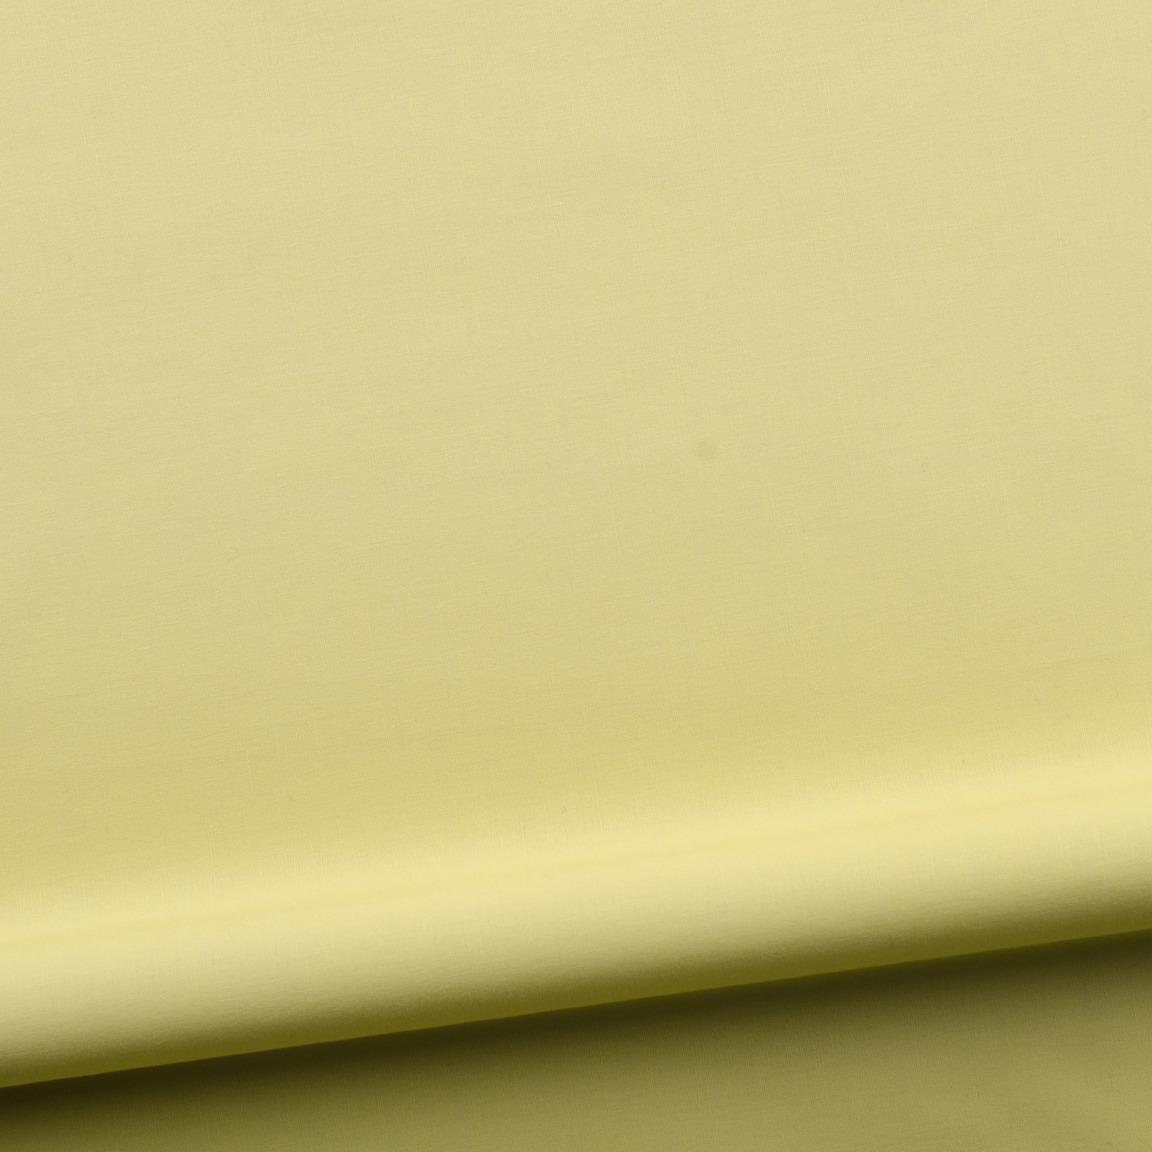 Amadora, yellow